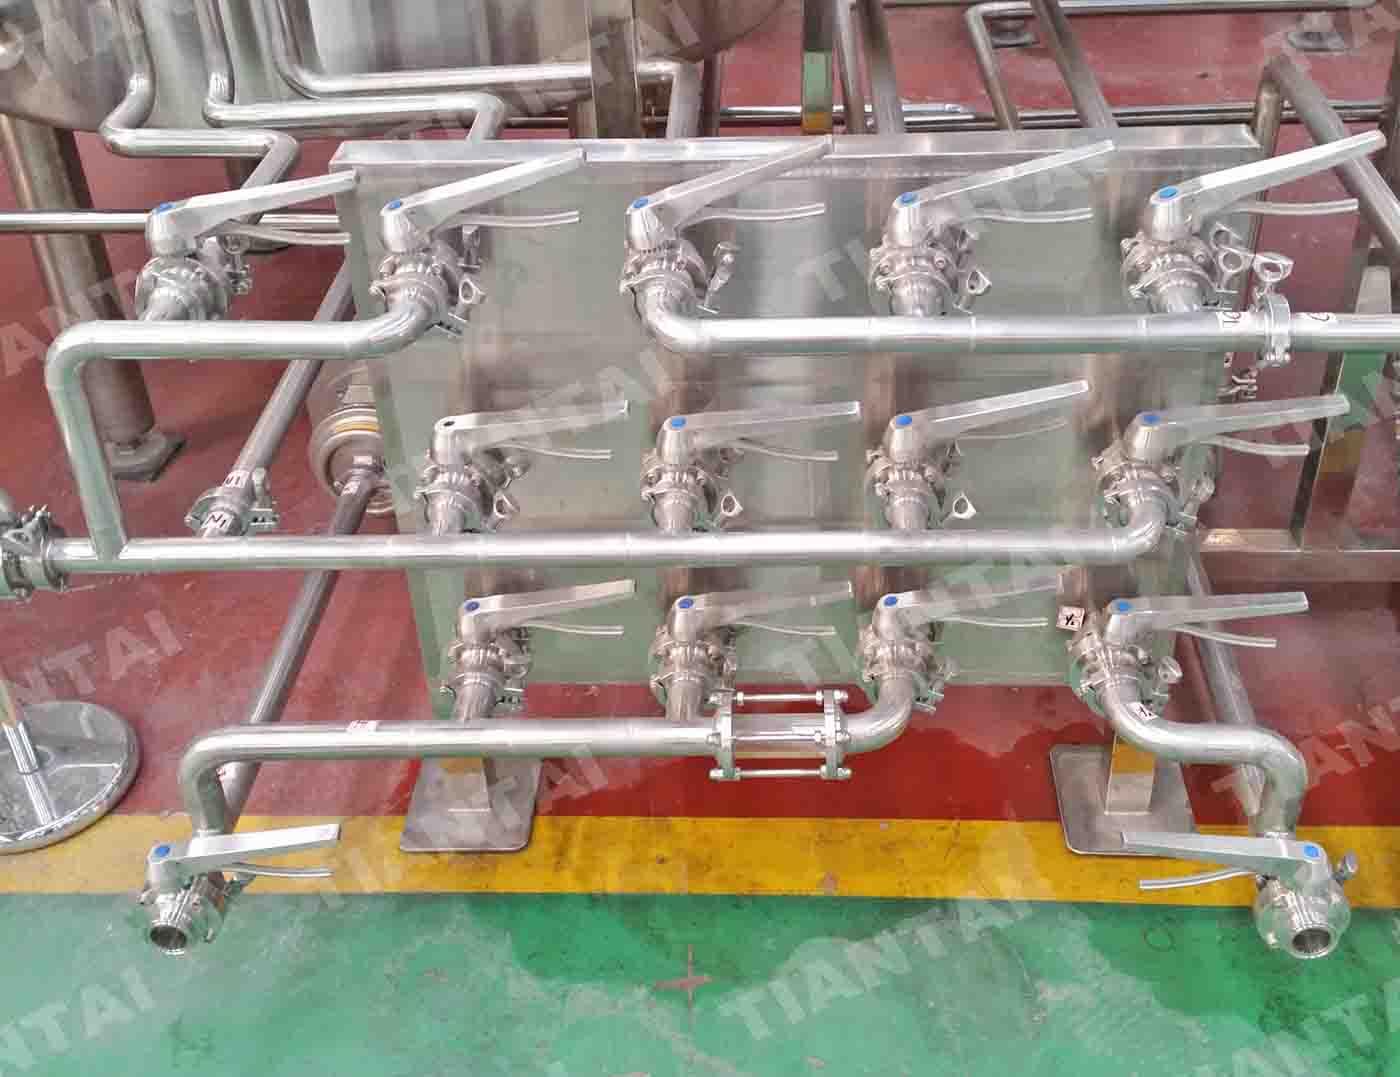 10 bbl Copper mashing equipment